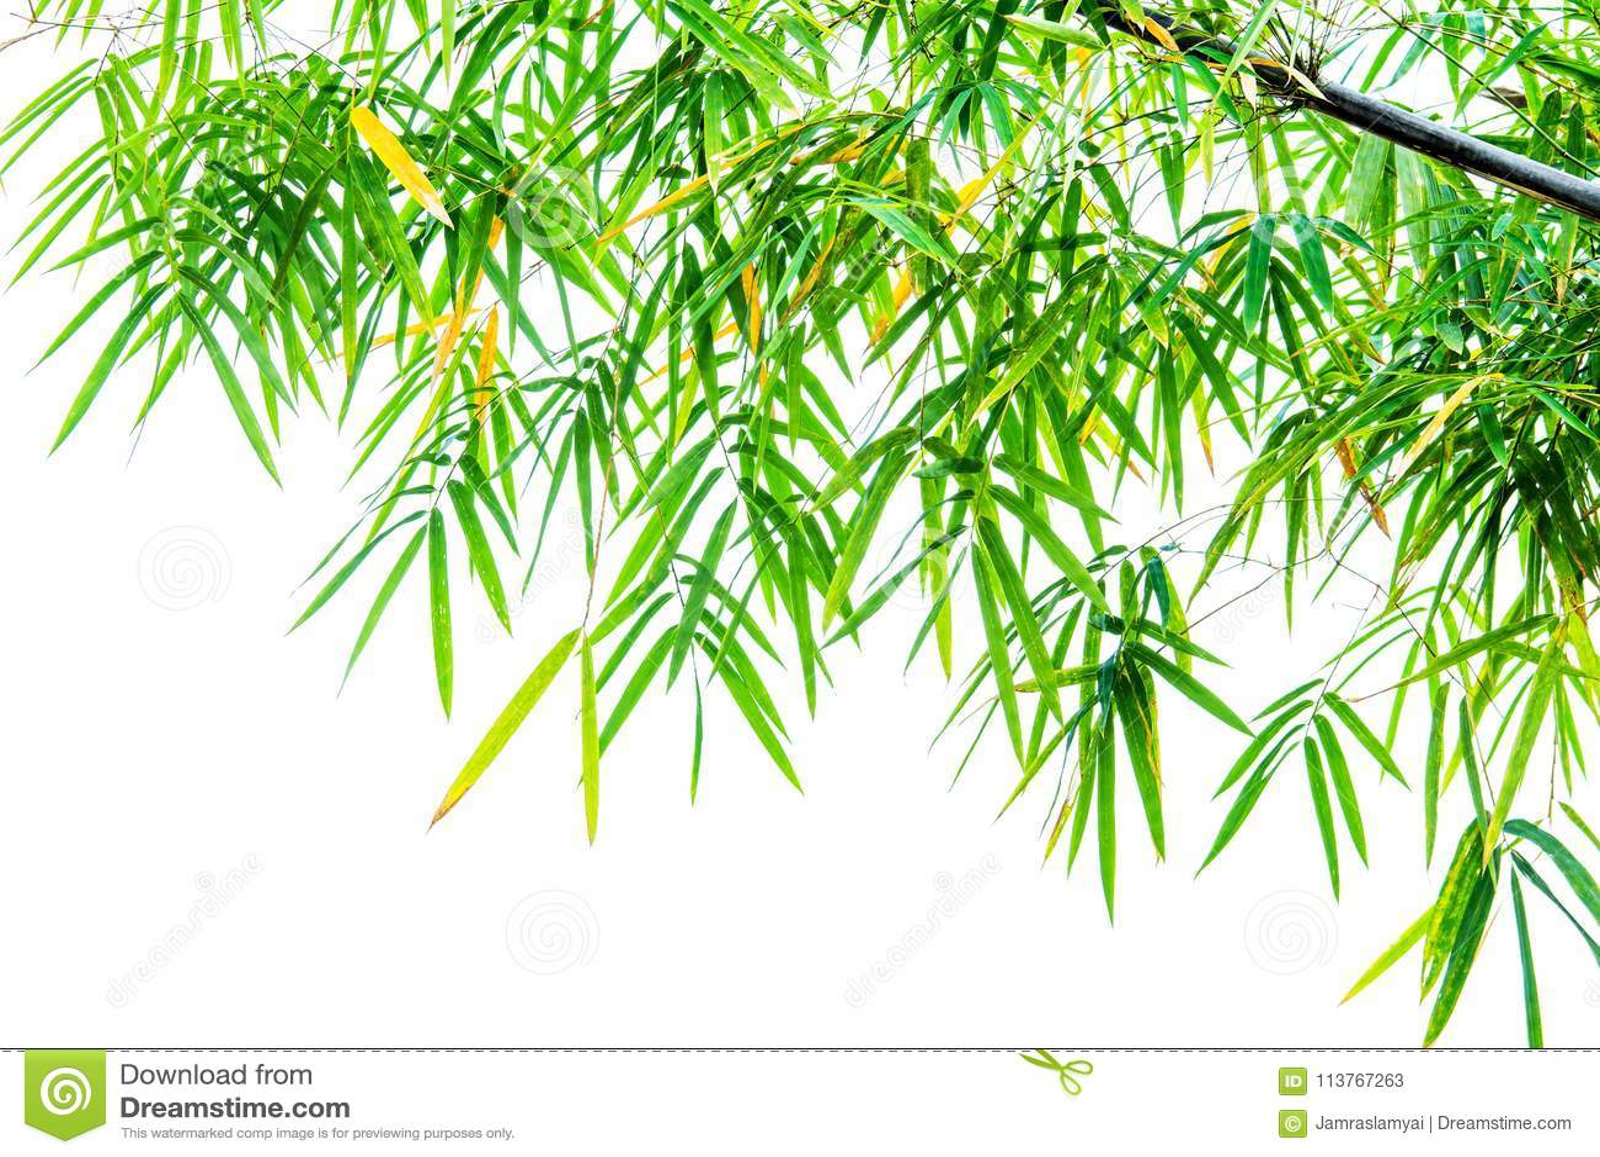 Foglia Di Bamb.Foglia Di Bambu Verde Su Bianco Immagine Stock Immagine Di